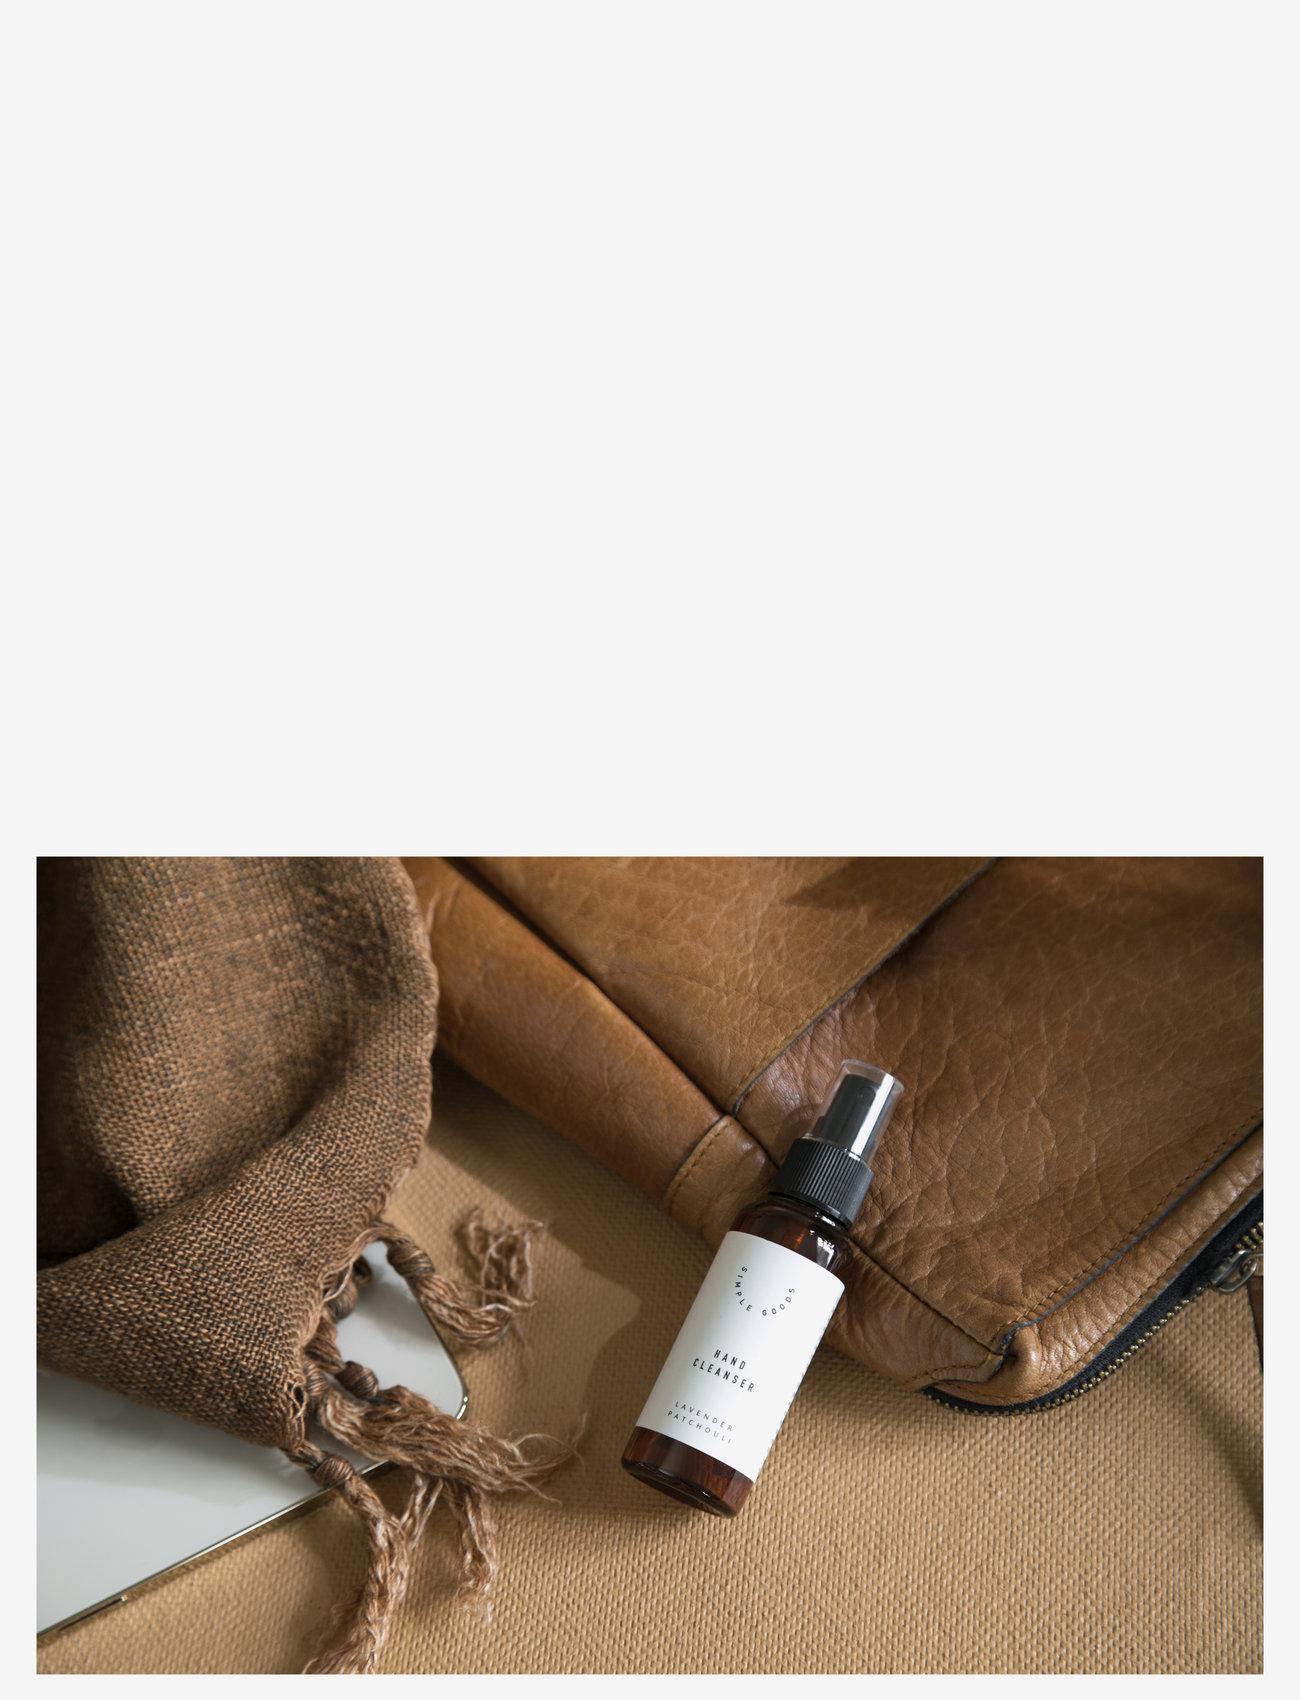 Simple Goods - Hand Cleanser, Lavender, 50 ml - kroppsvård - clear - 1